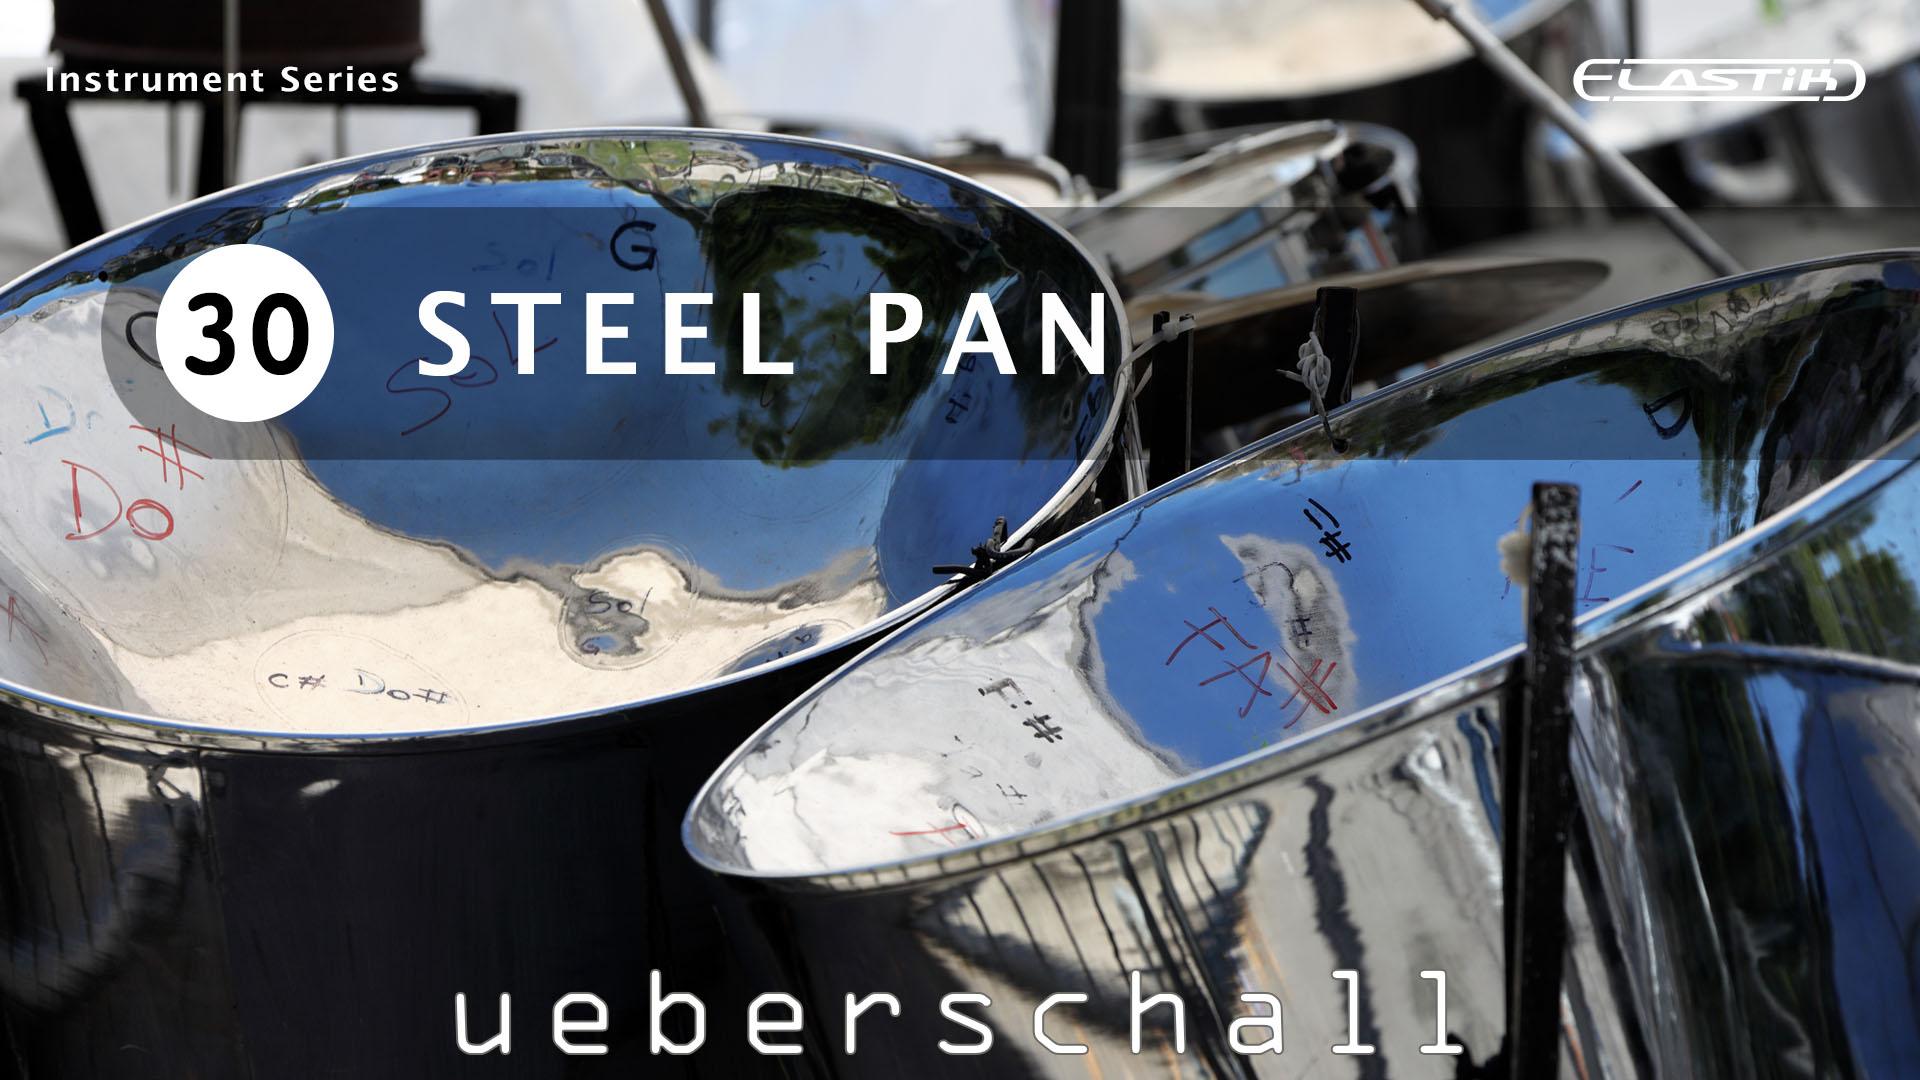 Steel Pan-Instrument-Series-Vol30-ueberschall-1920x1080.jpg